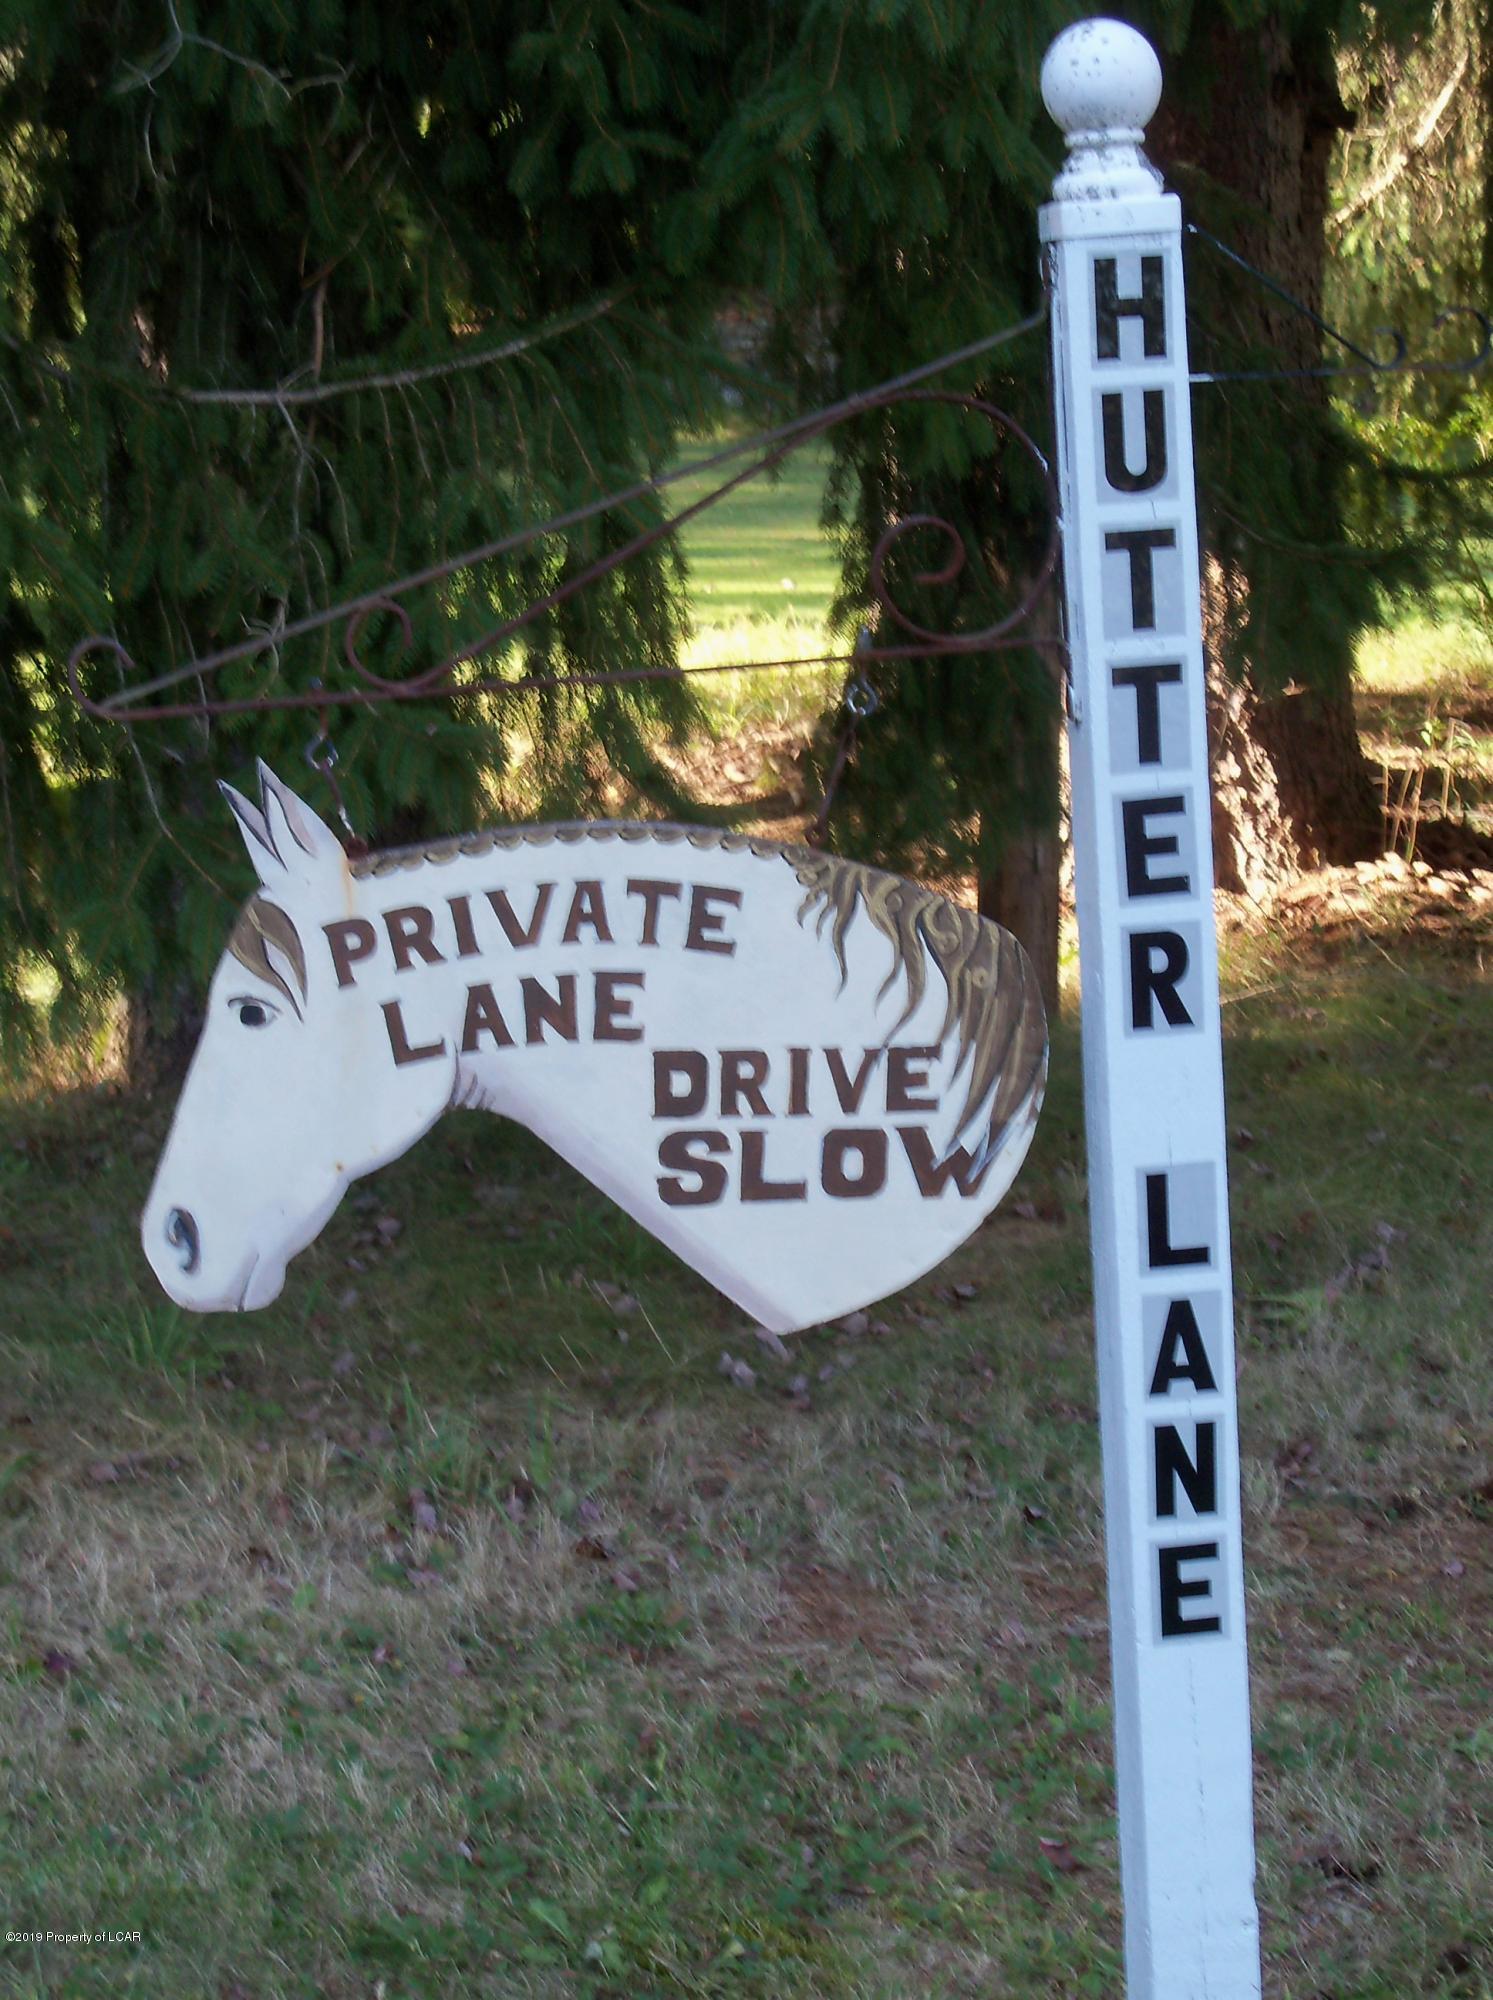 Hutter Lane